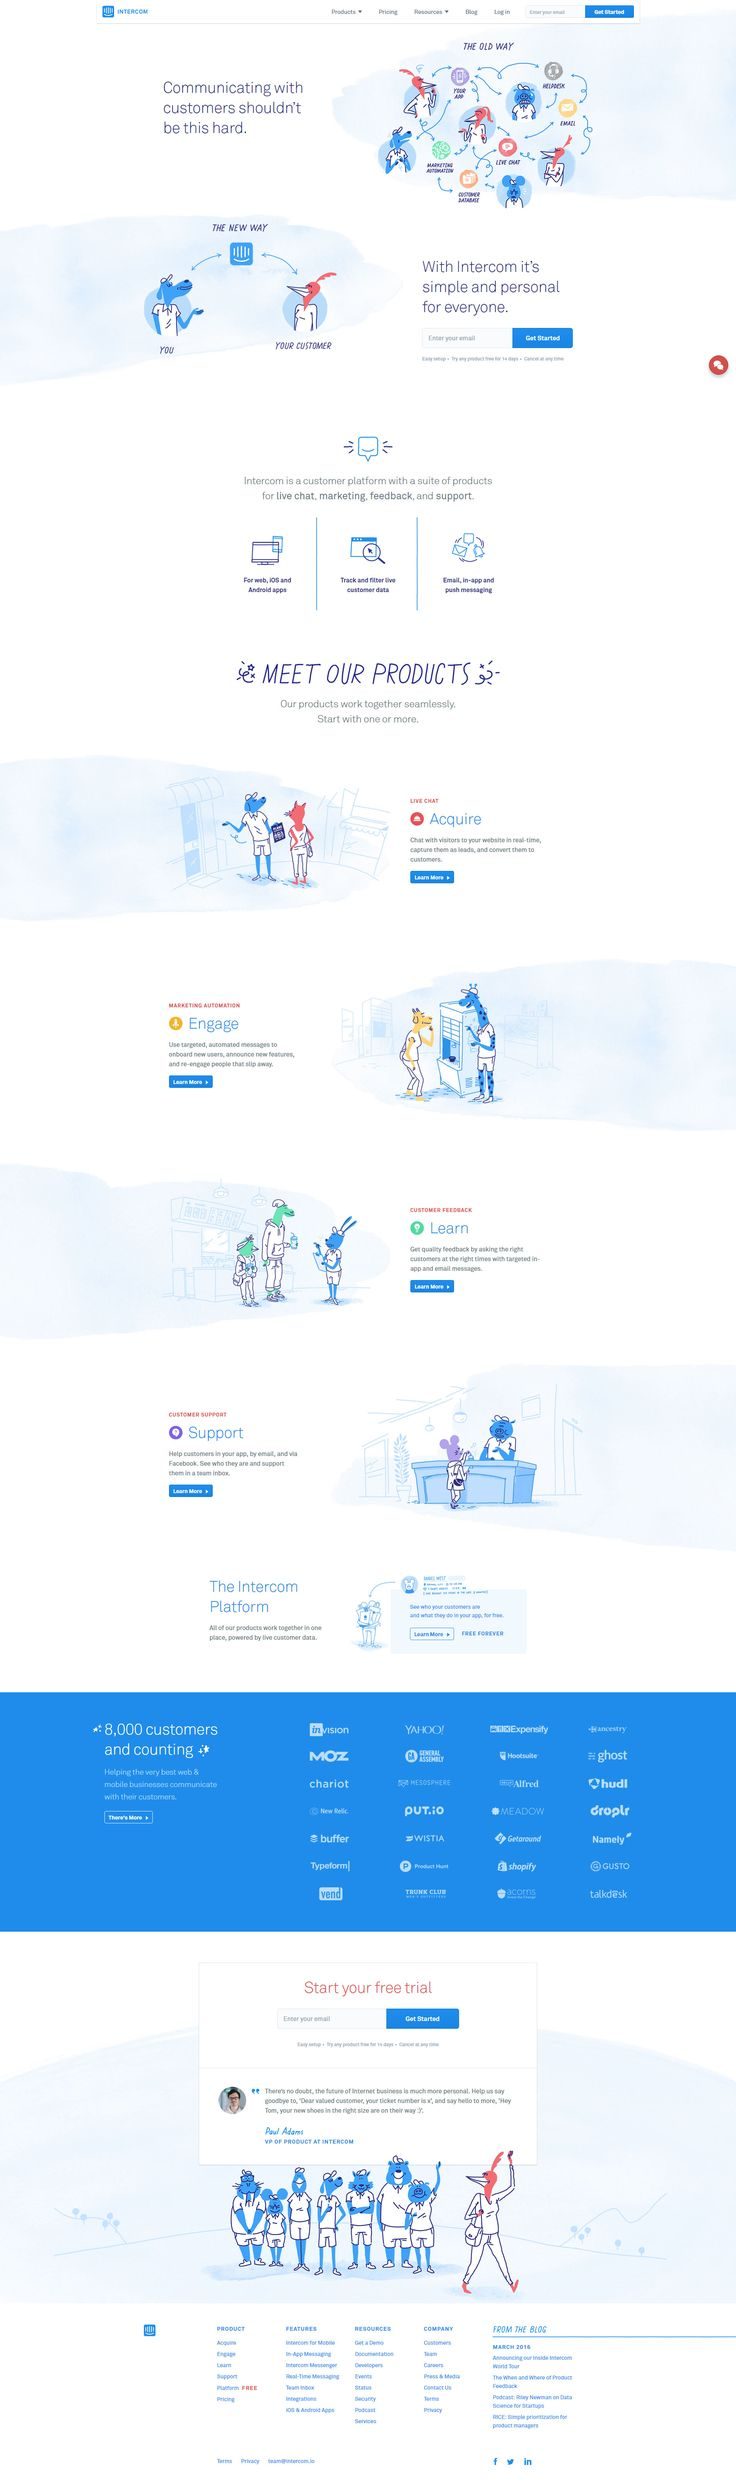 Intercom website - https://www.intercom.io/